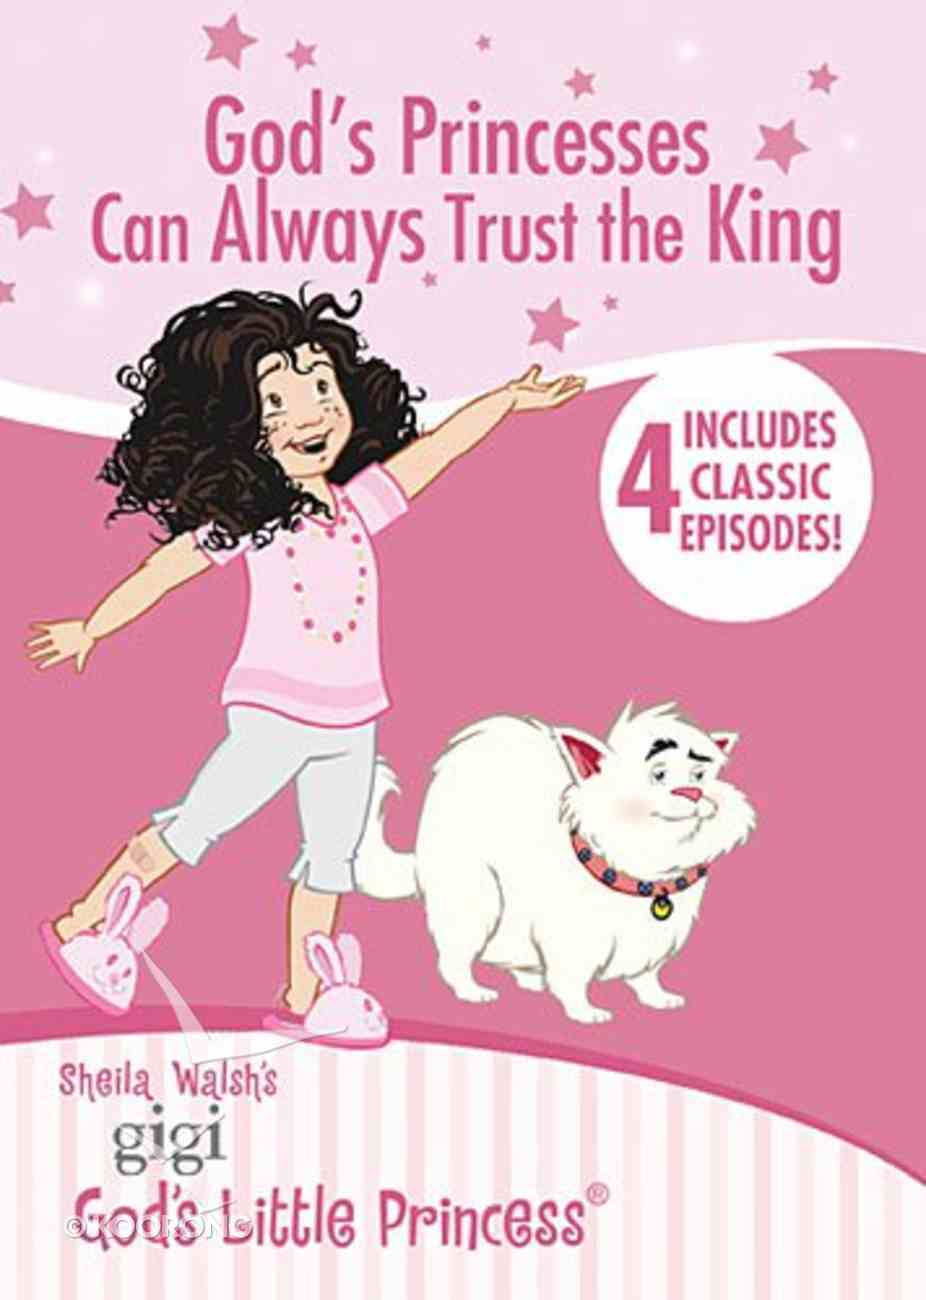 God's Princesses Can Always Trust the King (Gigi, God's Little Princess Series) DVD